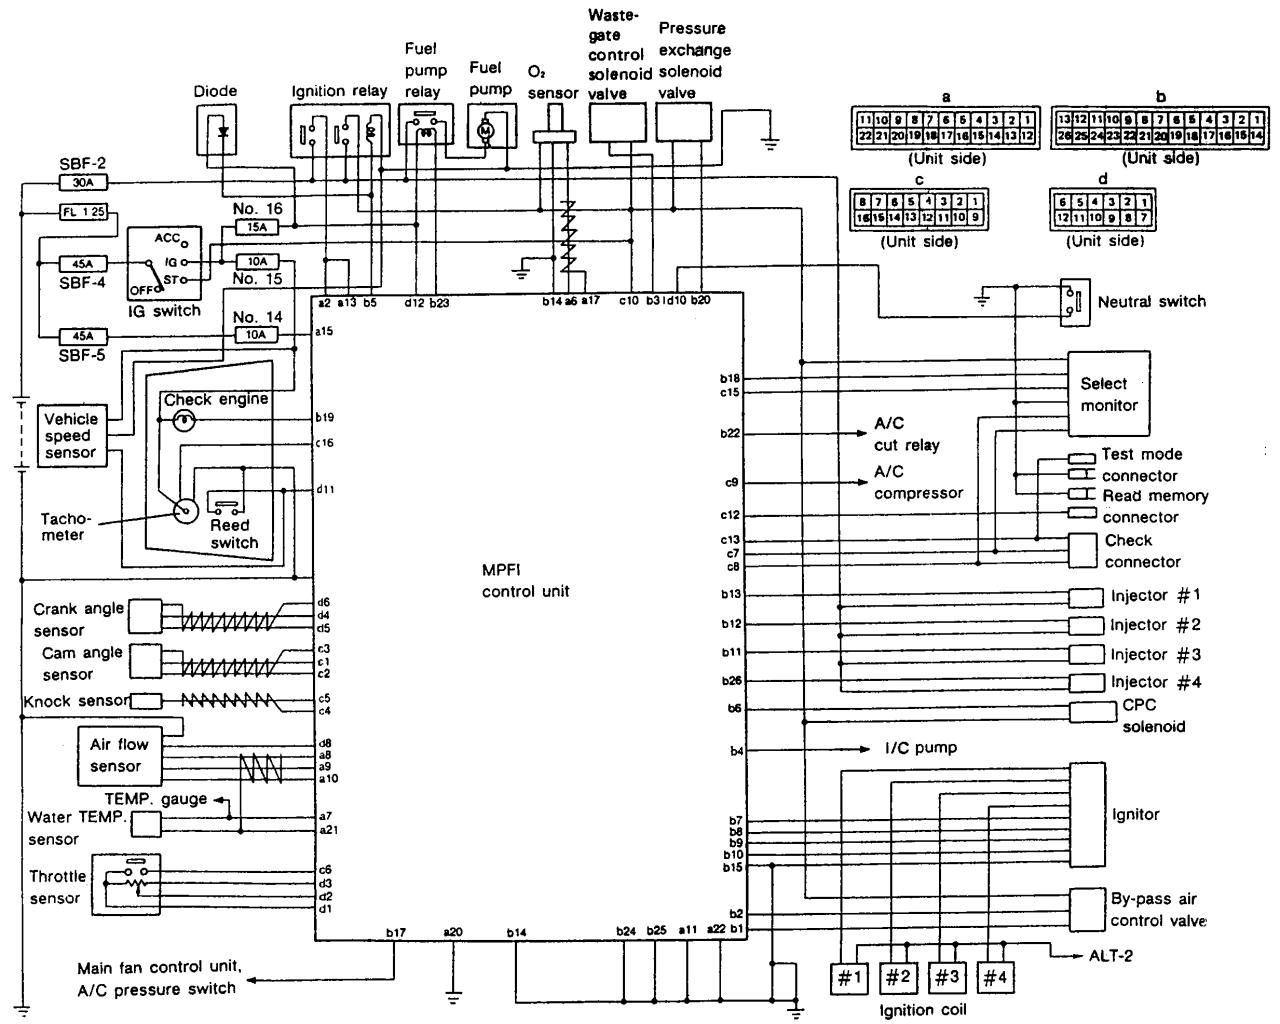 Peachy Subaru Impreza 2 0I Engine Diagrams Basic Electronics Wiring Diagram Wiring Cloud Biosomenaidewilluminateatxorg